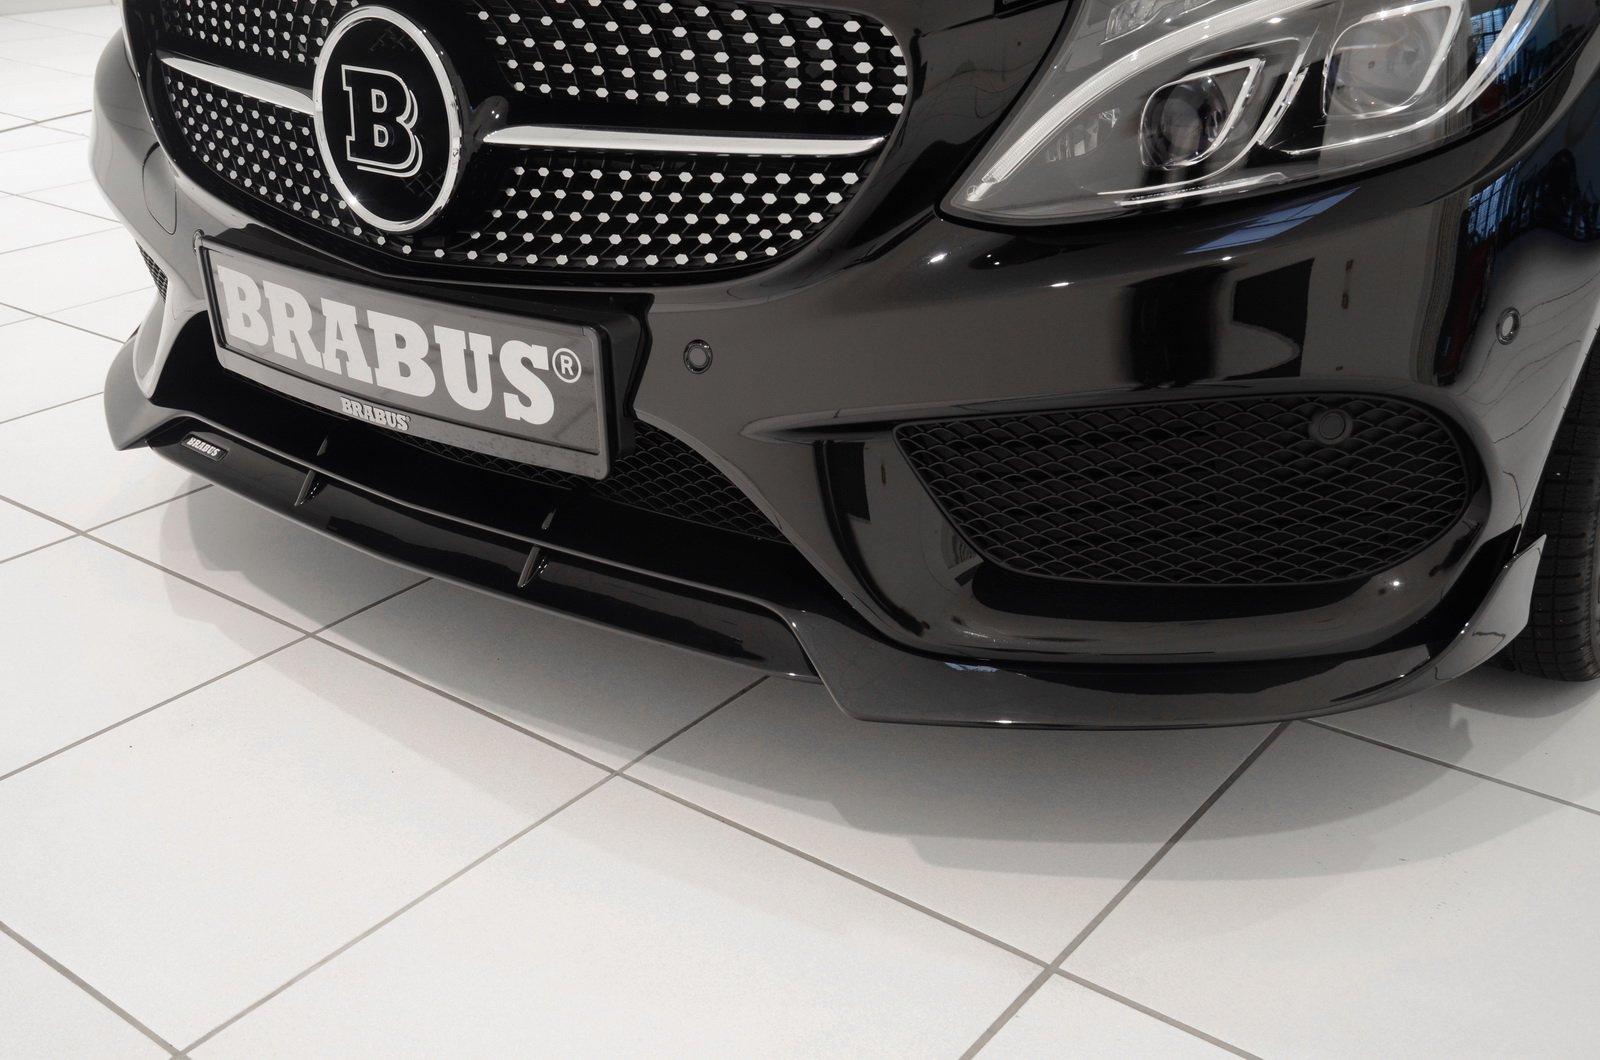 Brabus Mercedes-Benz C43 AMG